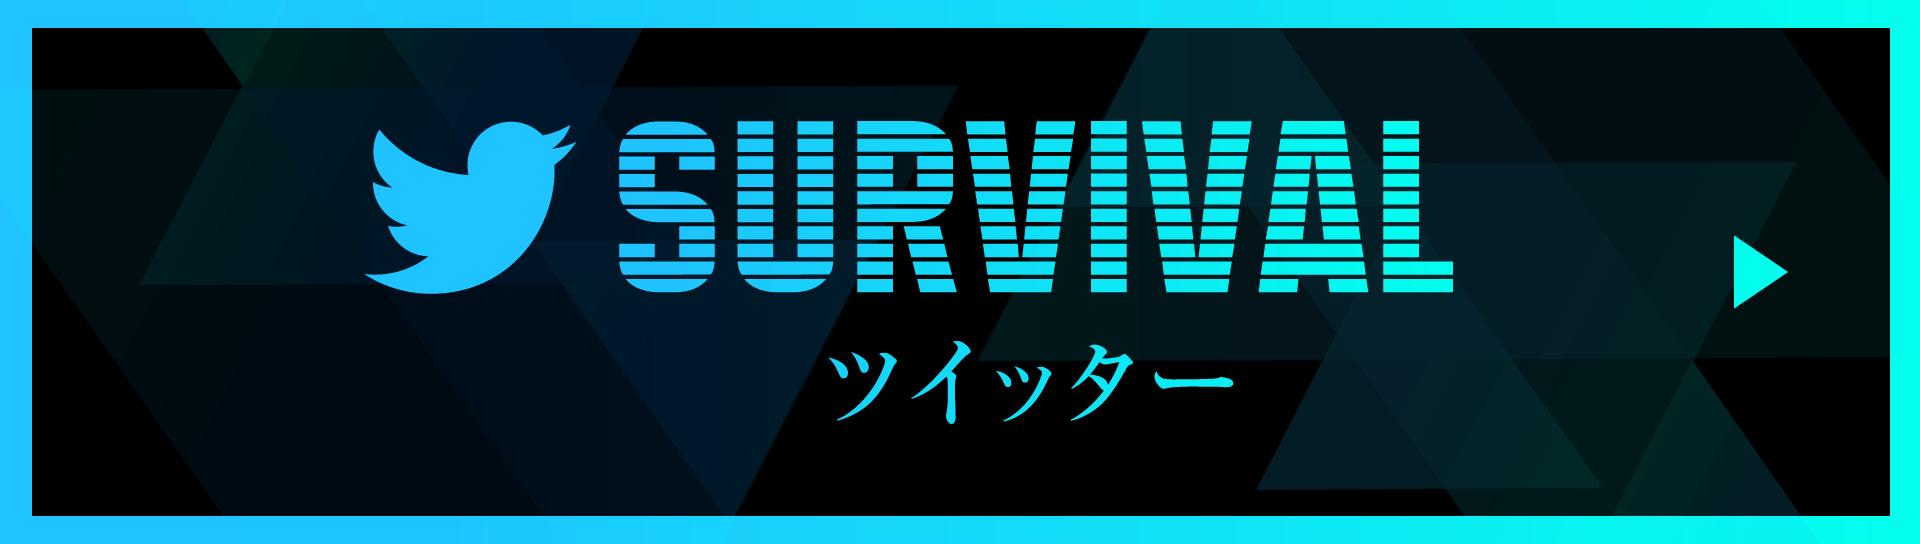 SURVIVAL ツイッター